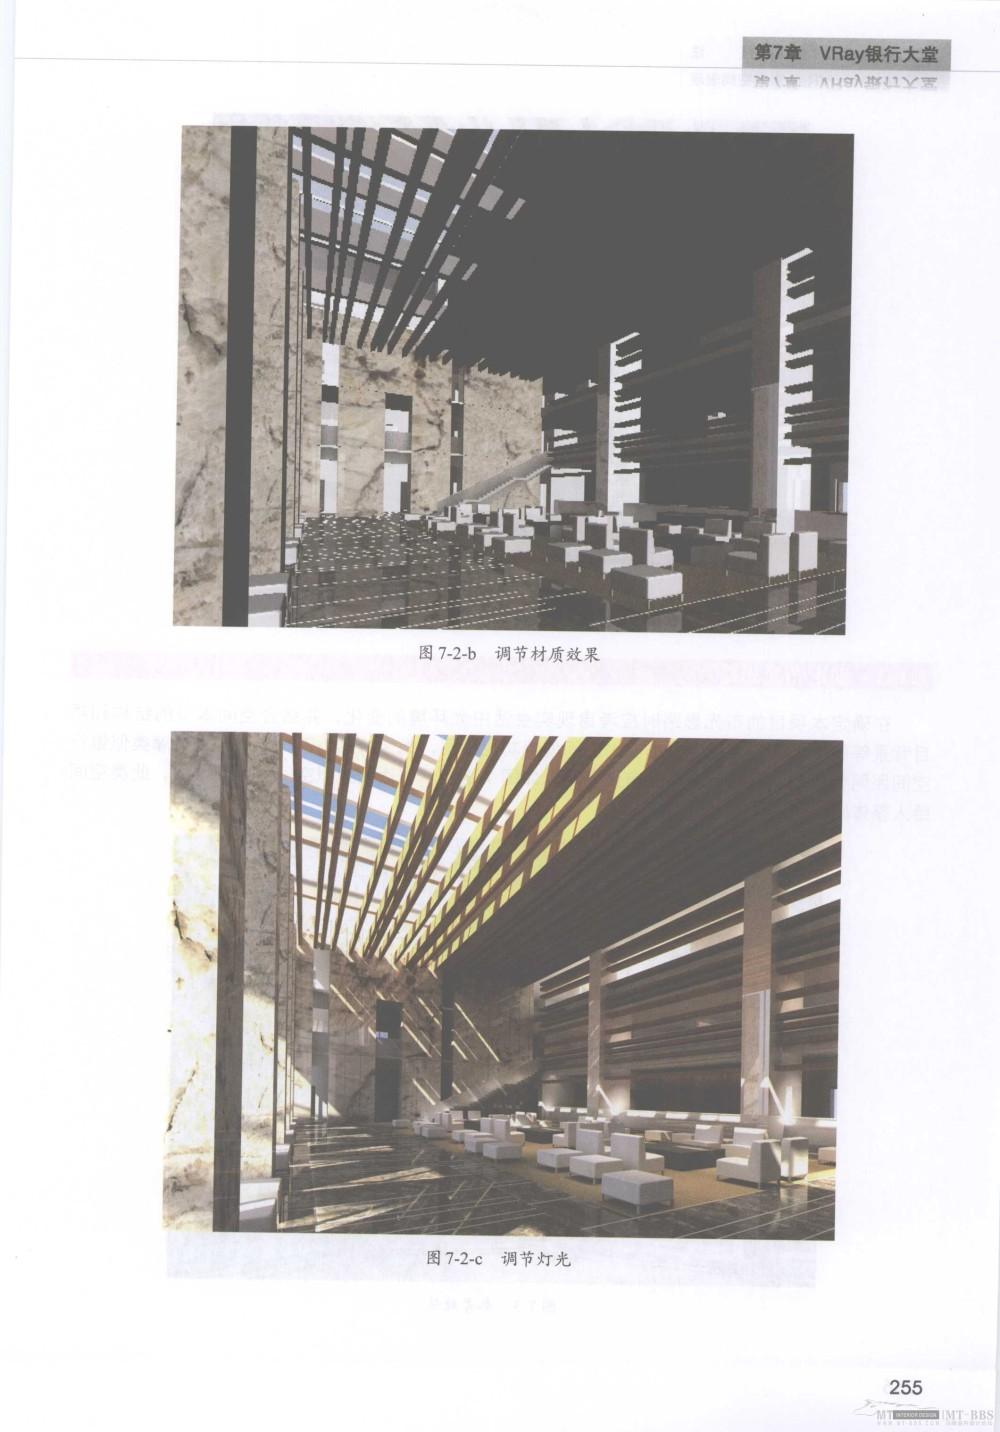 水晶石技法-3ds_Max&VRay室内空间表现_水晶石技法-3ds_Max&VRay室内空间表现_页面_261.jpg